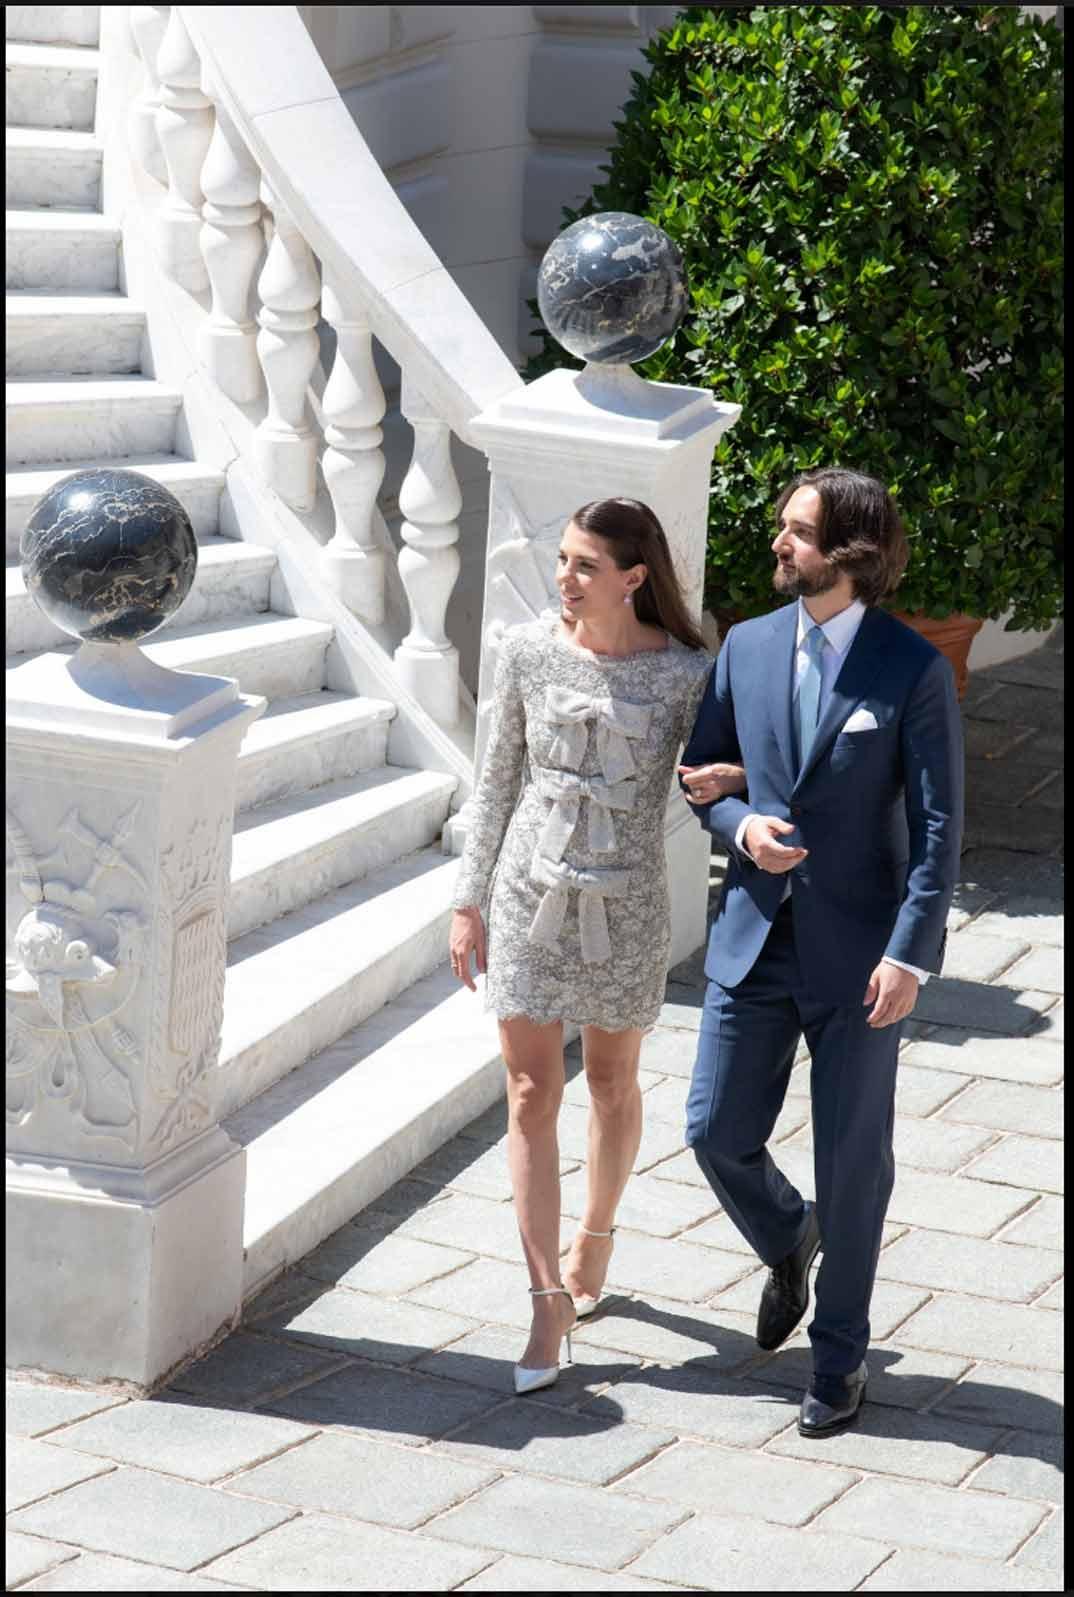 Boda Carolota Casiraghi y Dimitri Rassam - Crédit photo: Eric Mathon / Palais princier